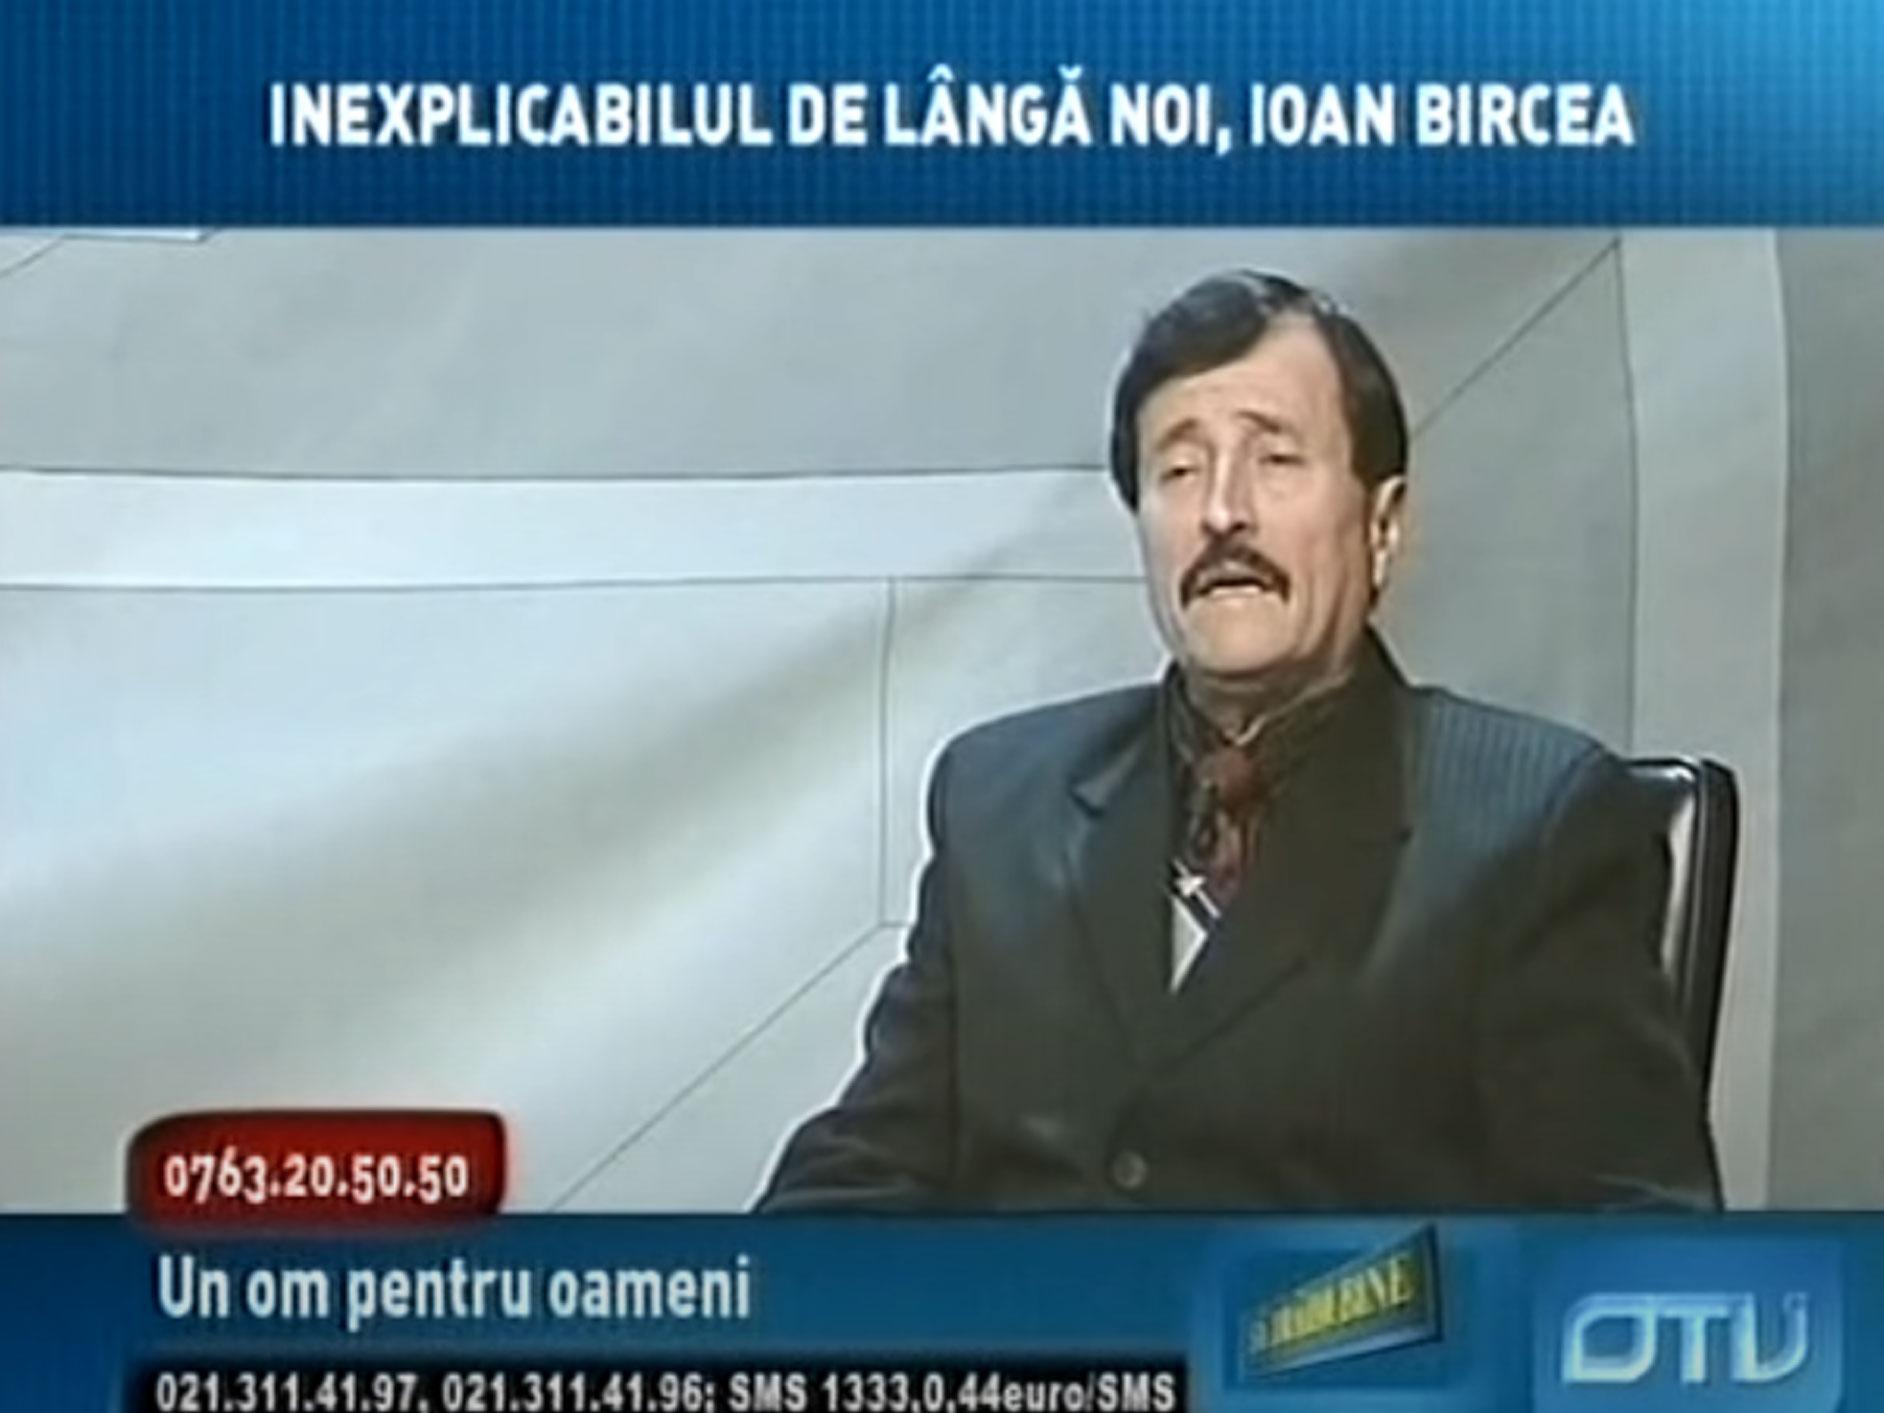 ioan-bircea-otv